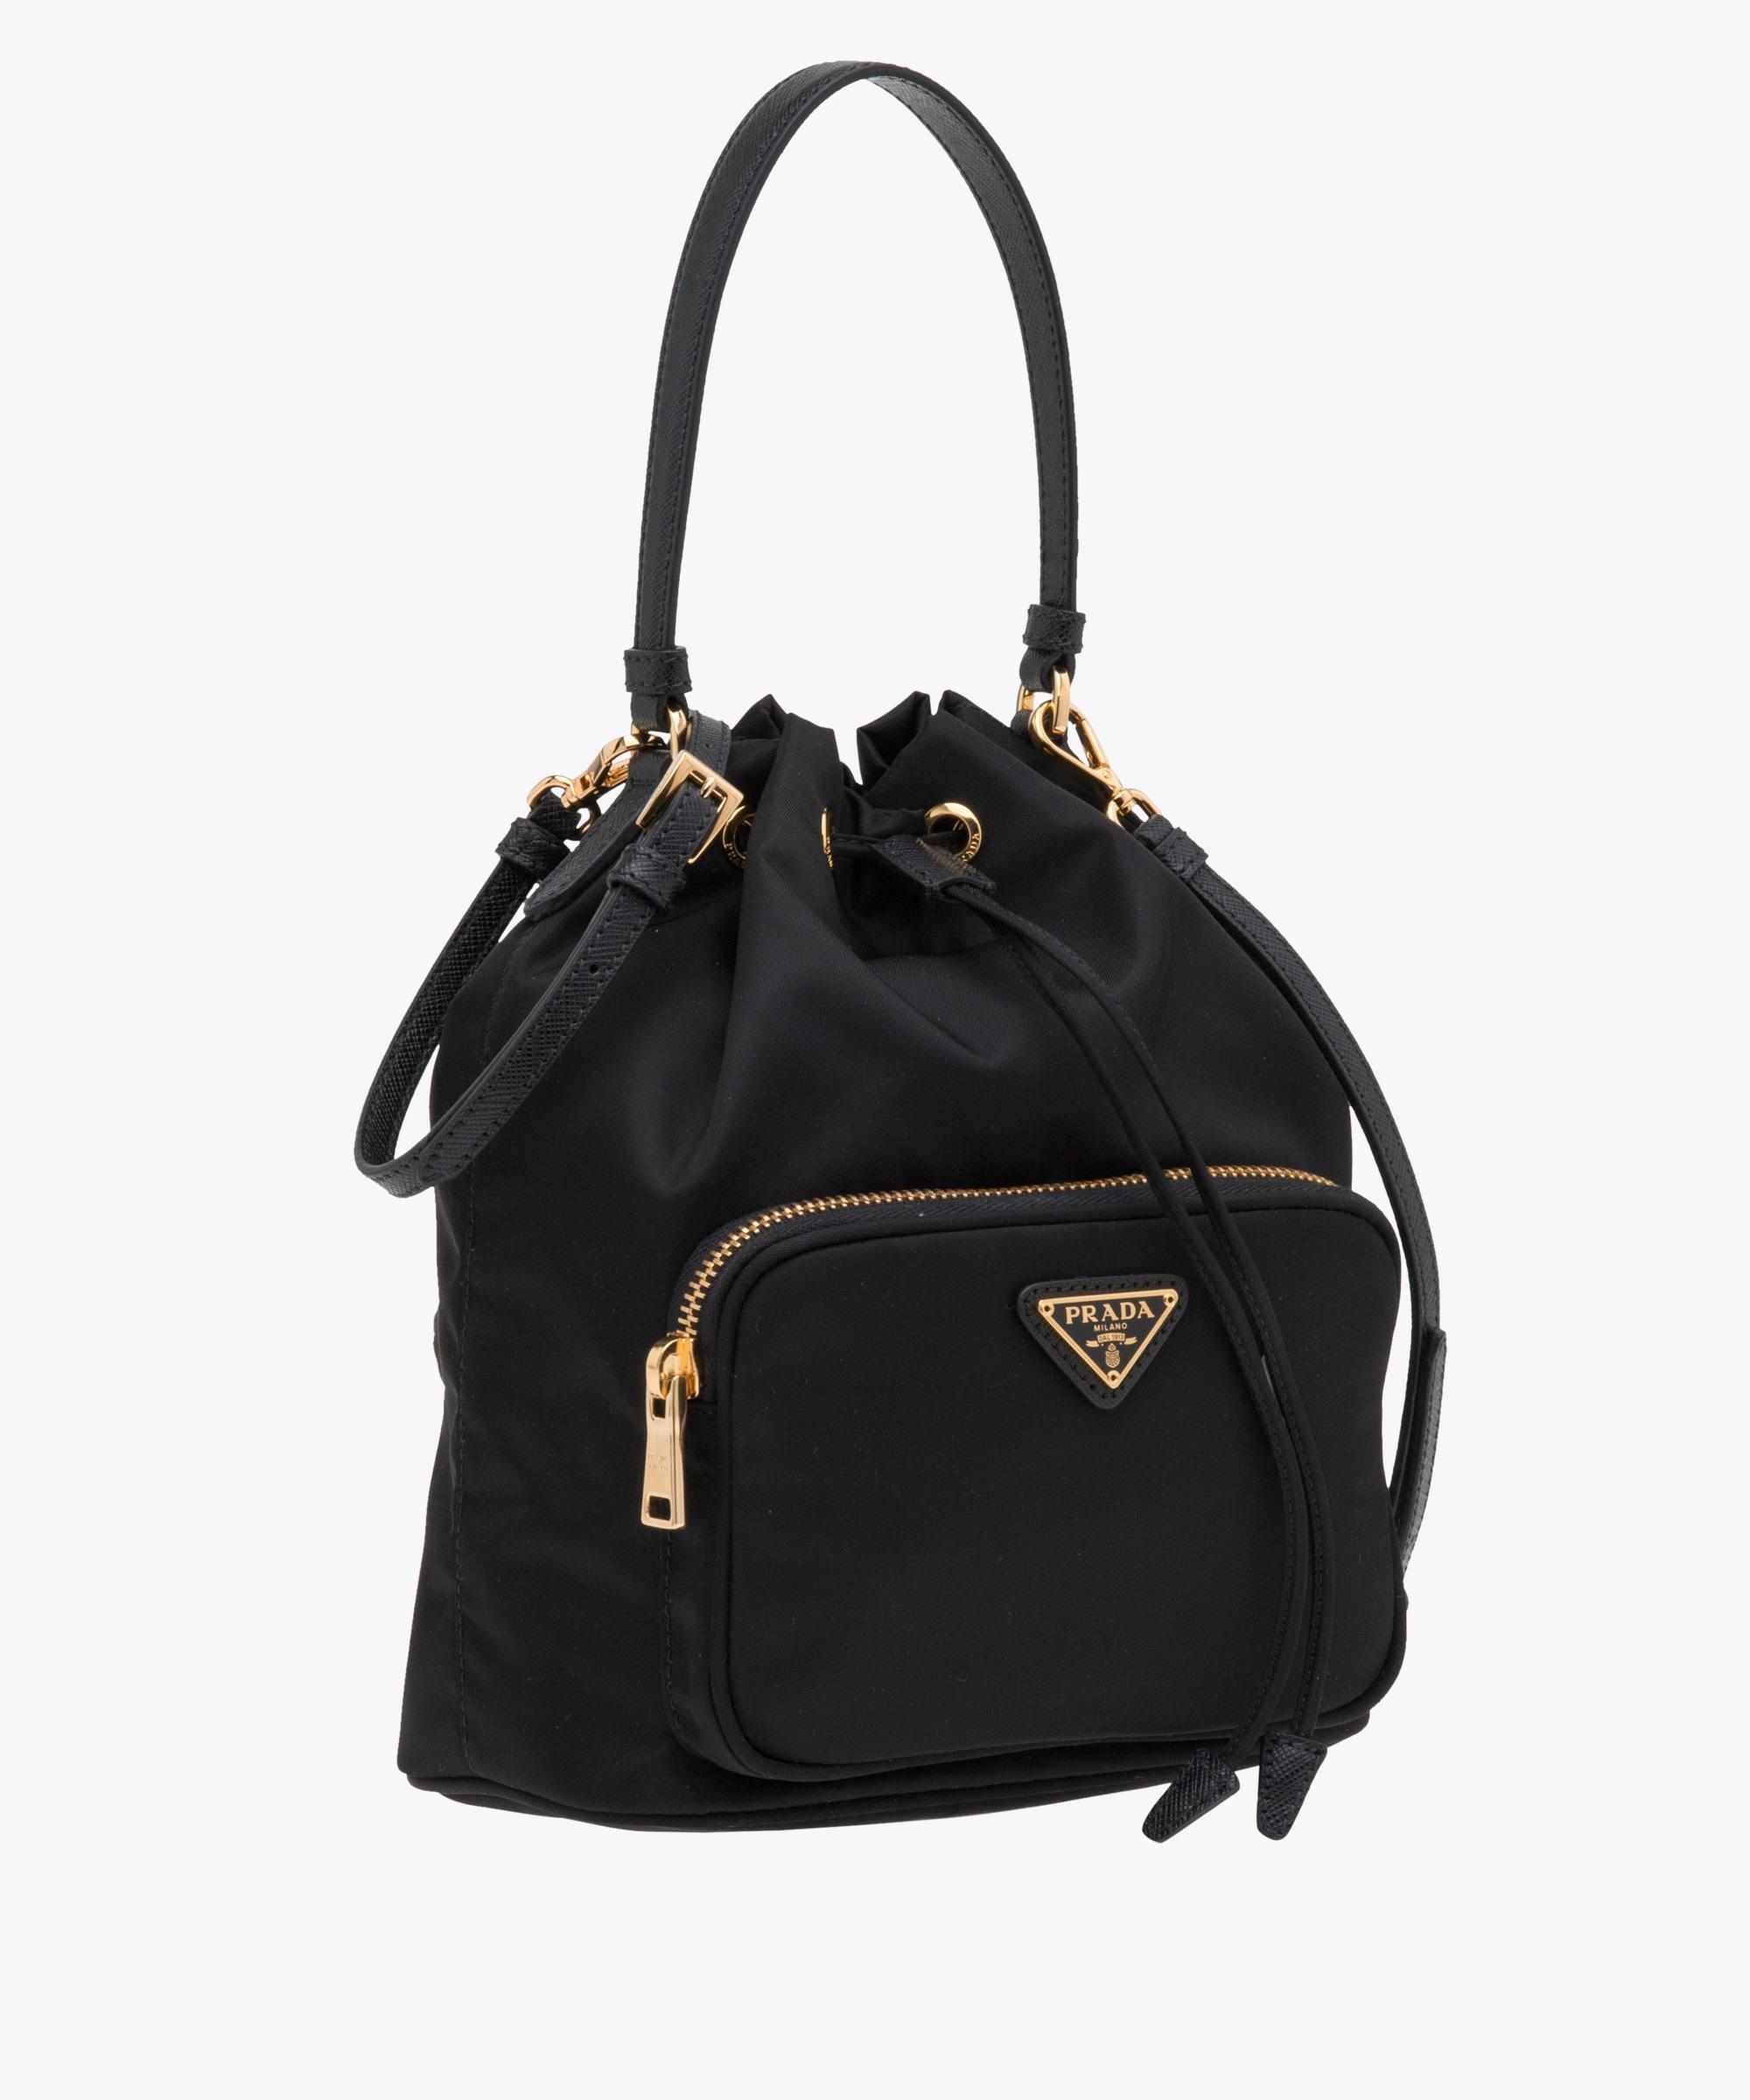 4f076aba60 ... new style lyst prada fabric mini bag in black 52625 87231